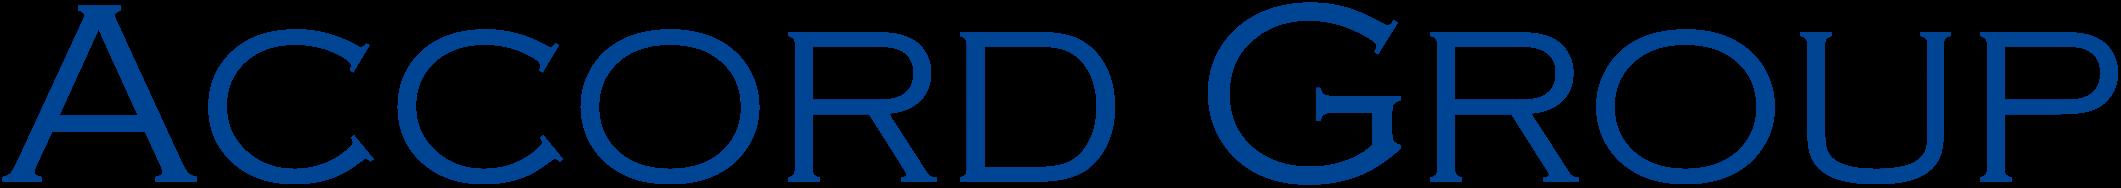 www.accord-ece.com - logo